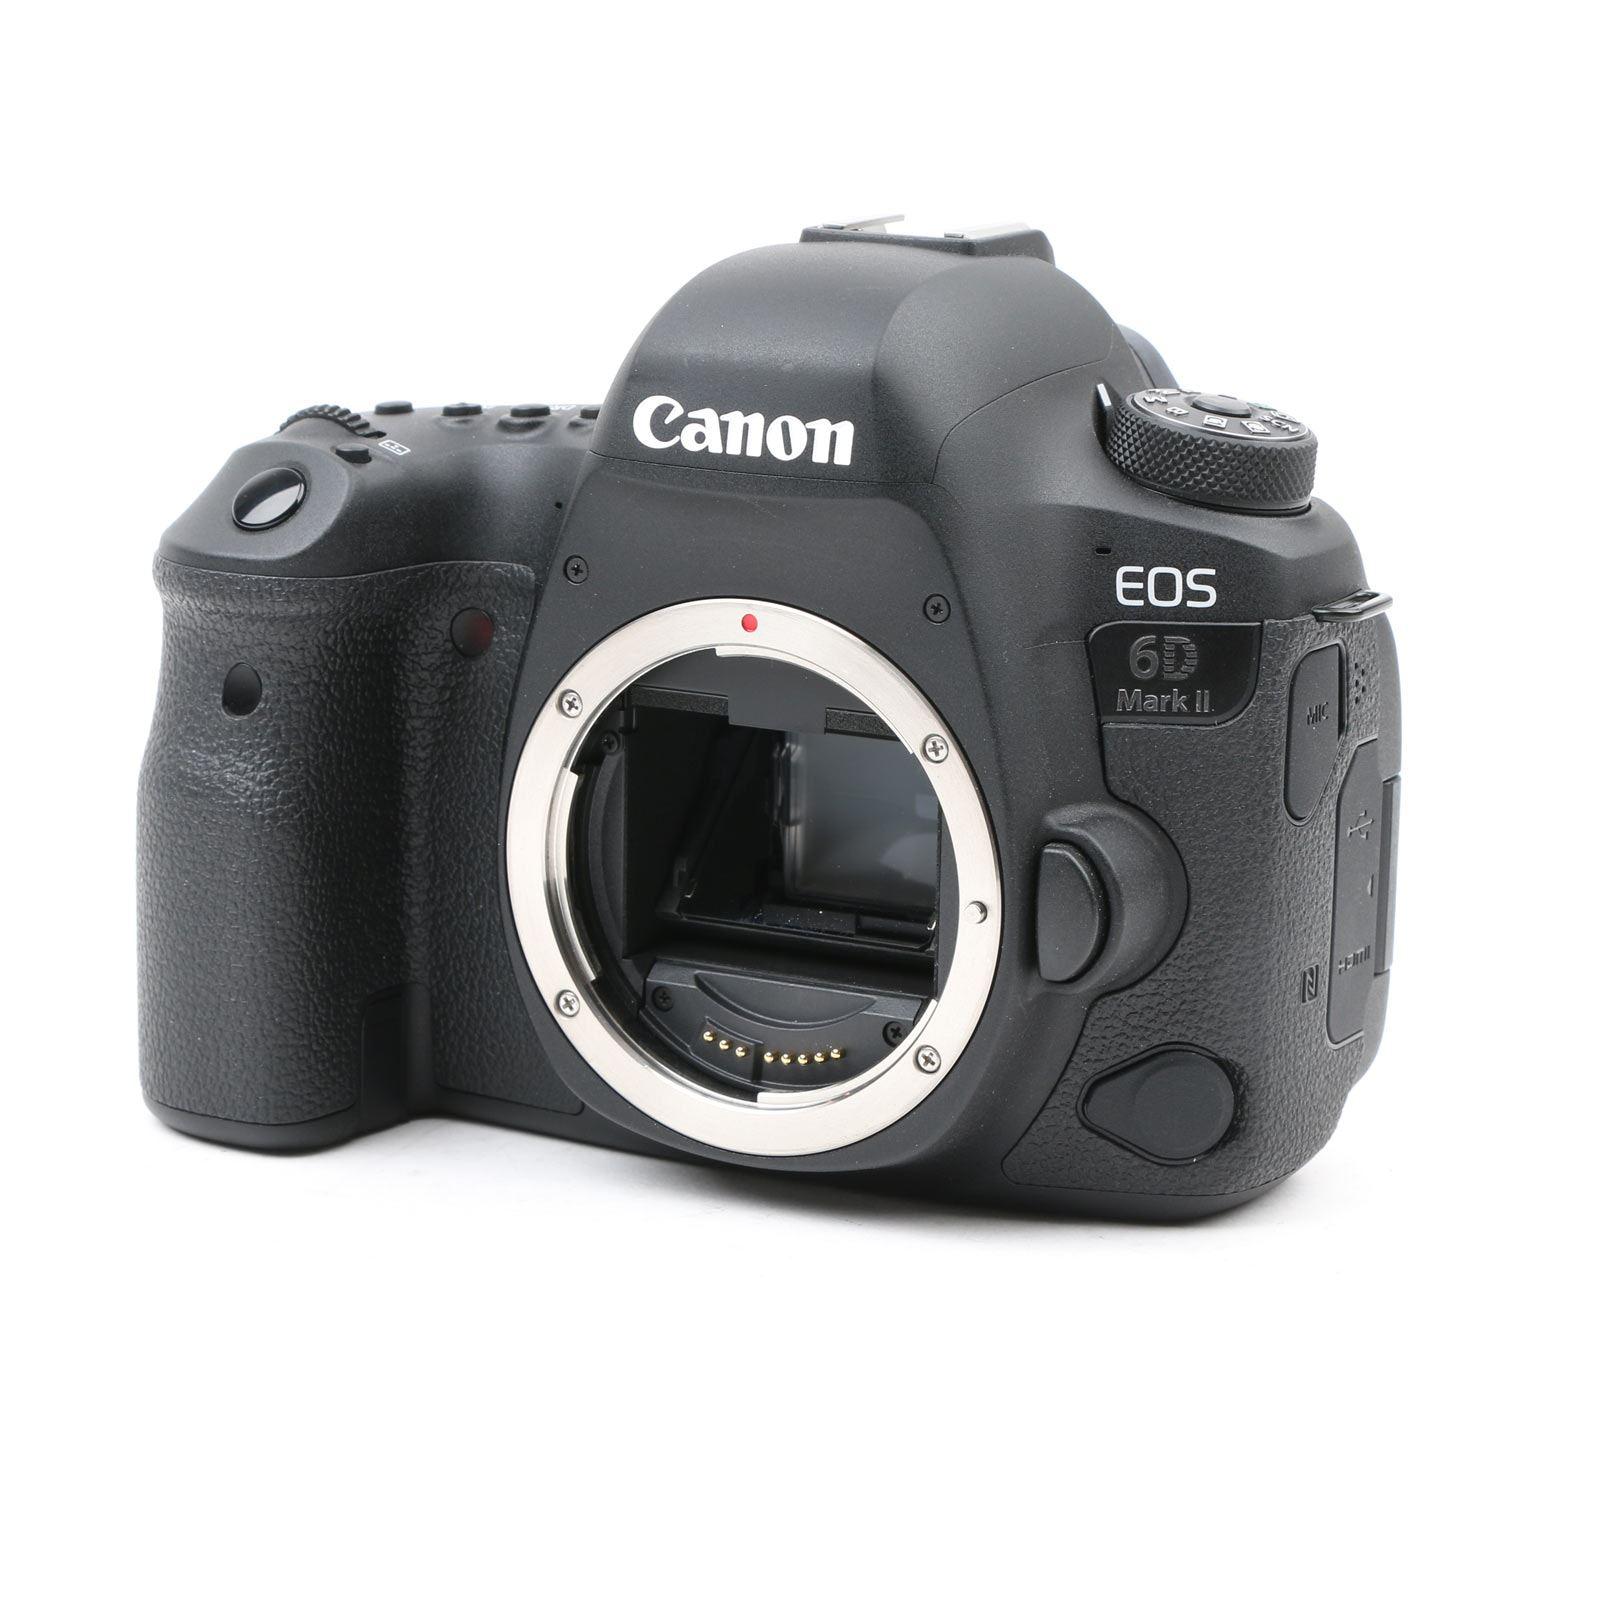 Image of Used Canon EOS 6D Mark II Digital SLR Camera Body